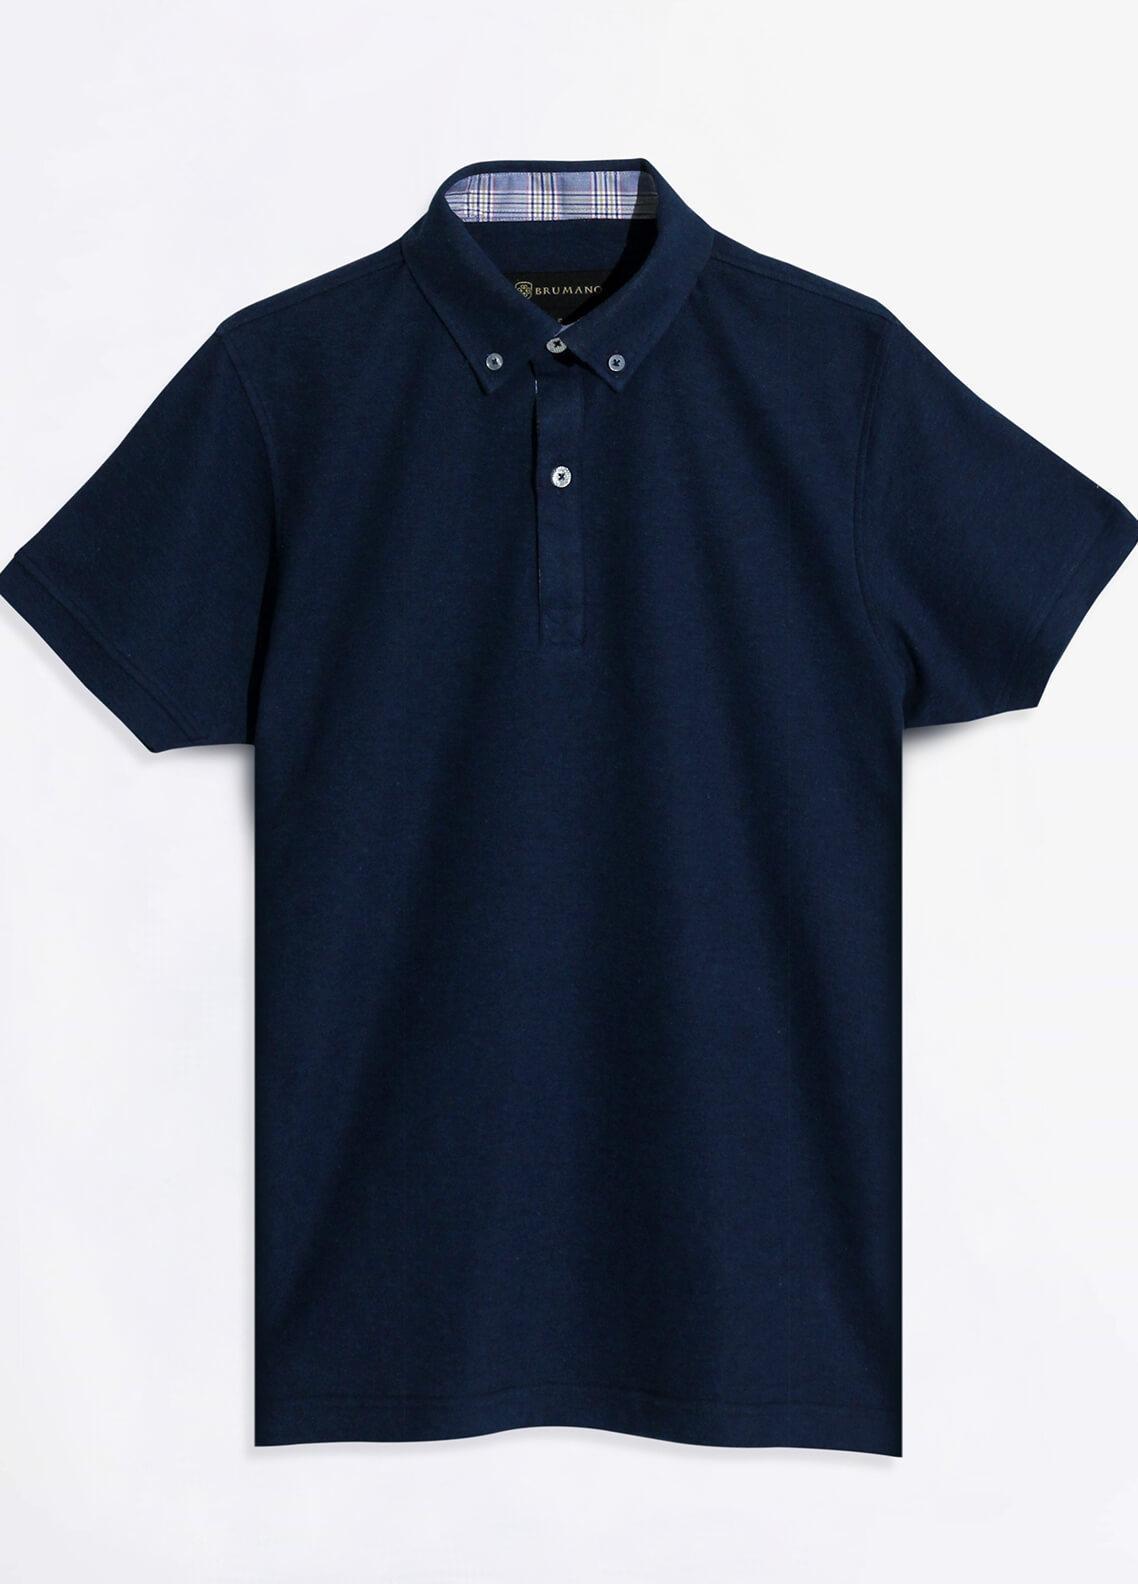 Brumano Cotton Polo Shirts for Men - Navy Blue BRM-41-105